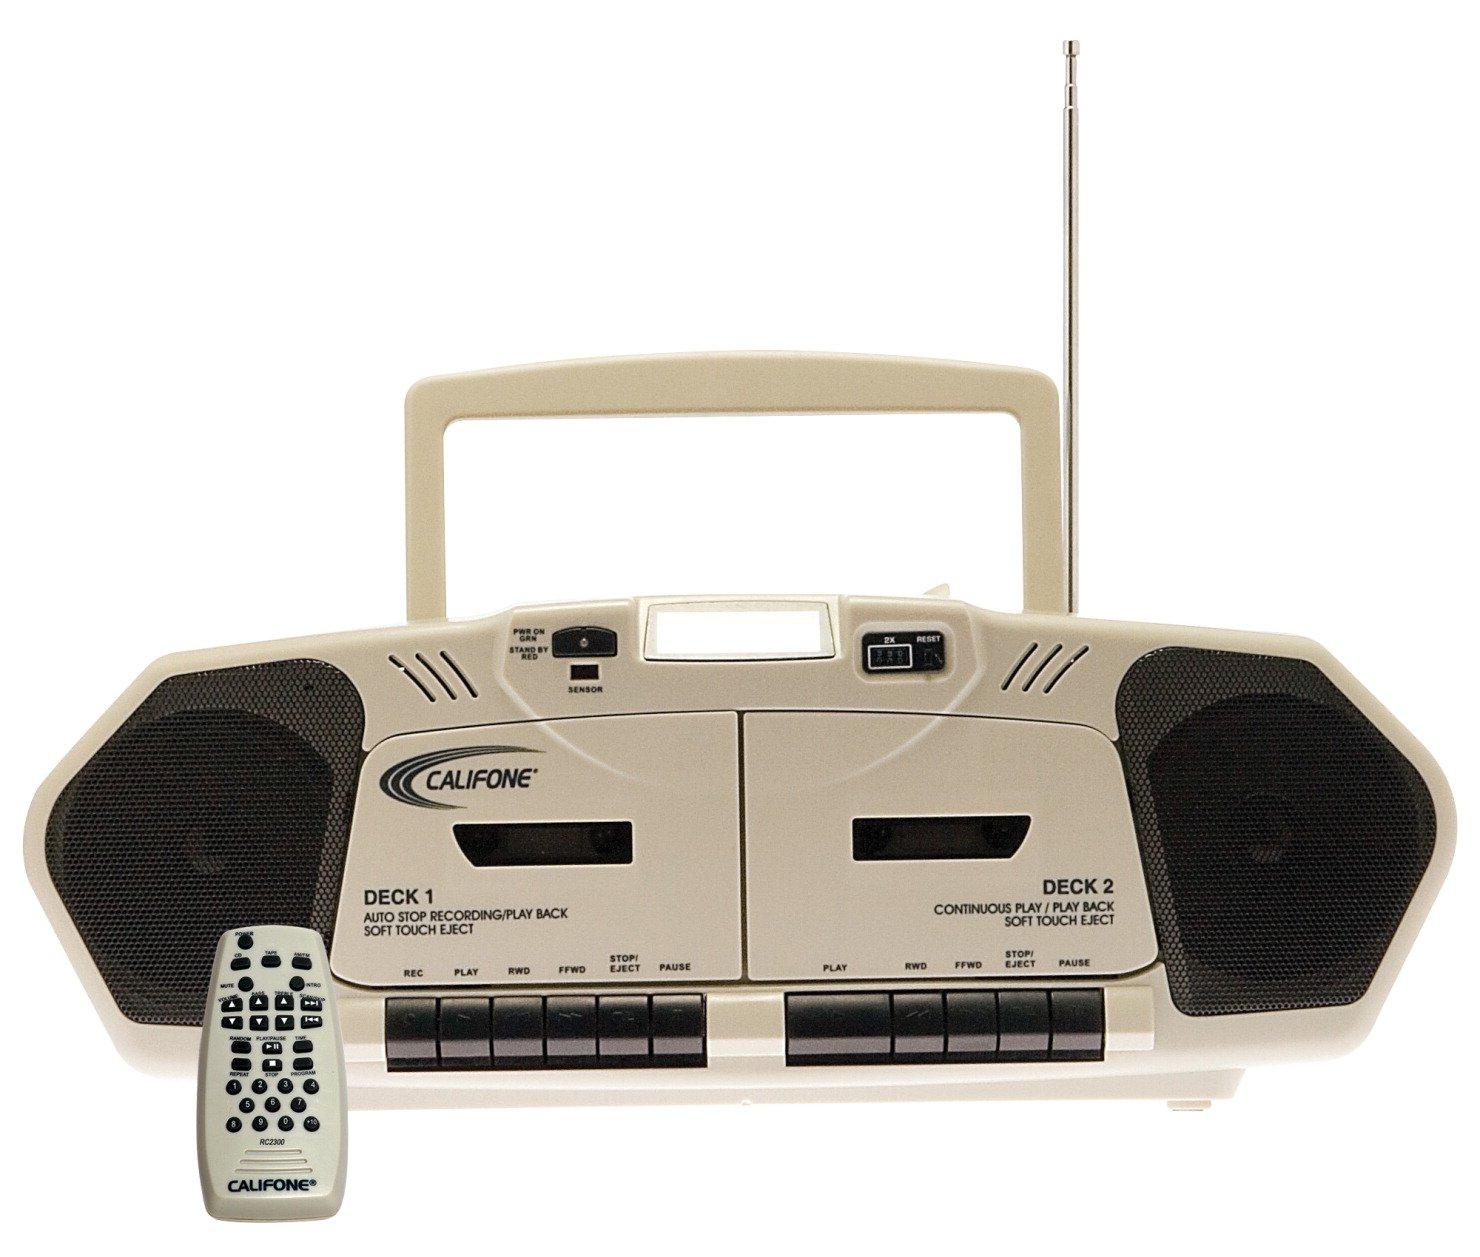 Califone 2395AV-02 Music Maker Plus Dual Cassette Recorder with CD, AM/FM, 6 Watts RMS by Califone